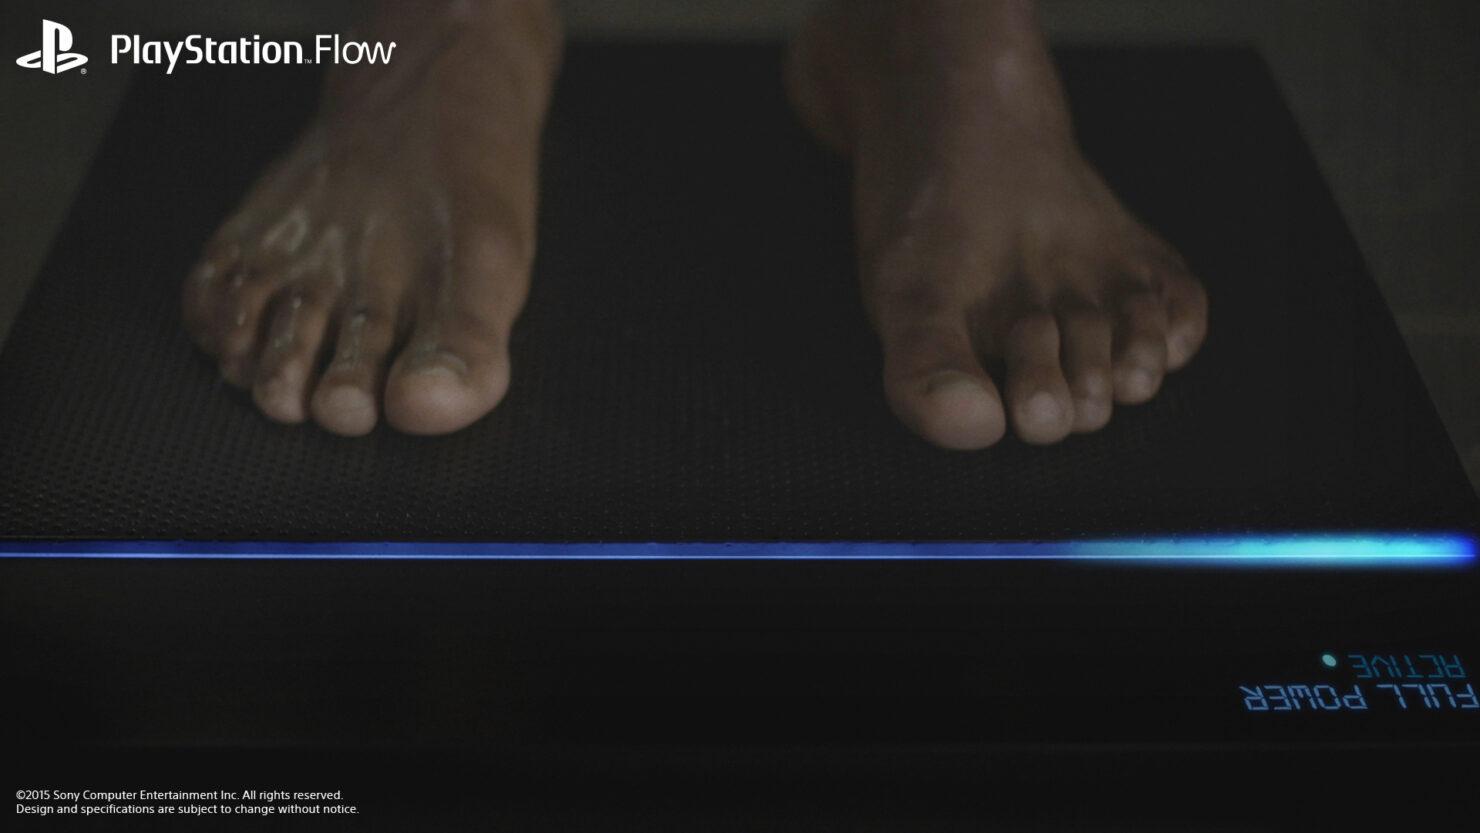 playstation-flow-6